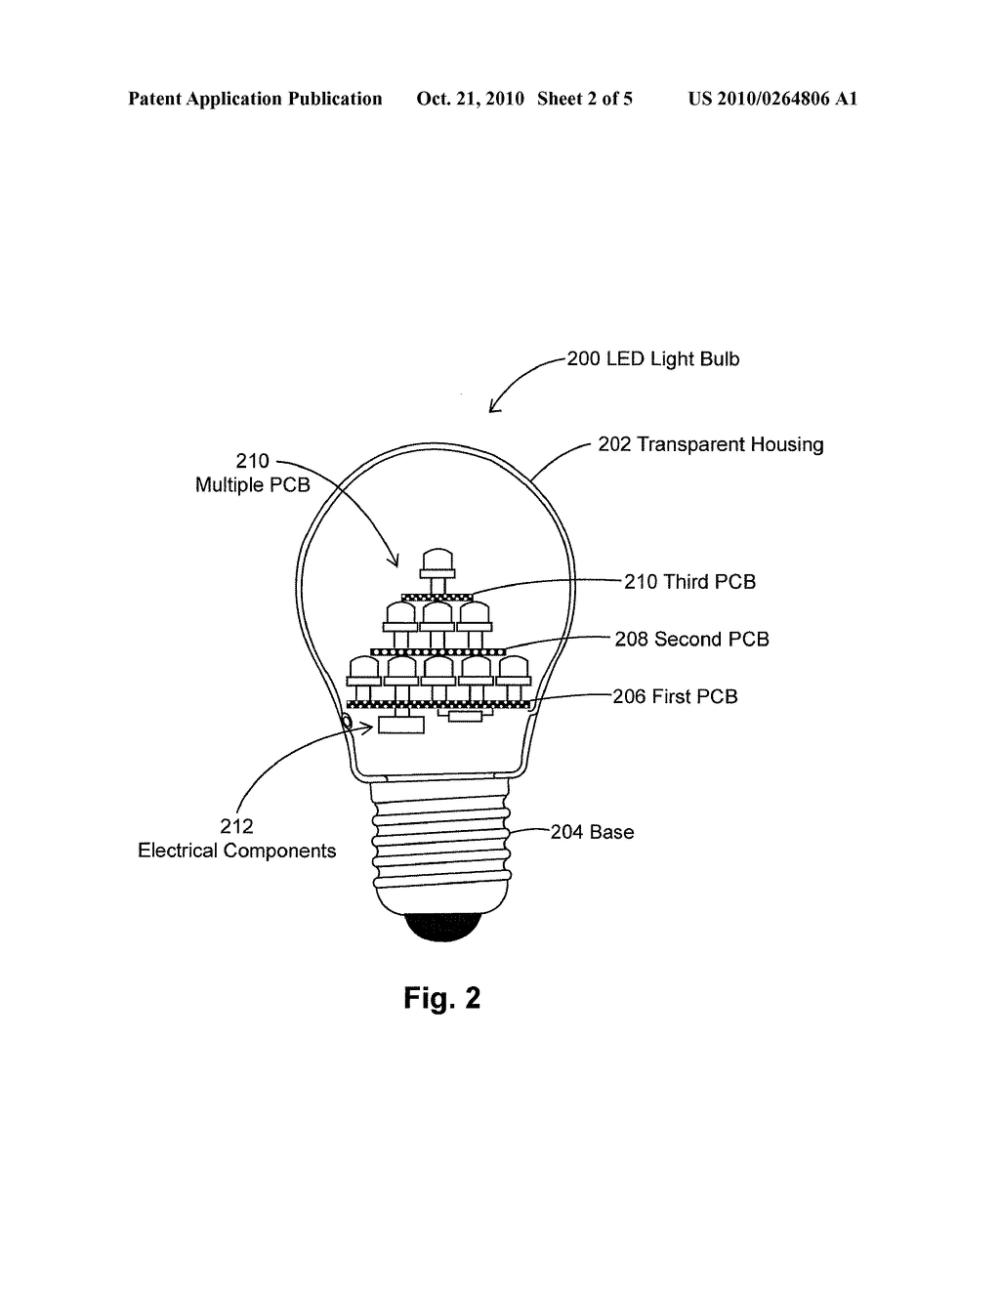 medium resolution of light bulbs diagram wiring diagram origin light bulb outlet diagram led light bulbs in pyramidal structure